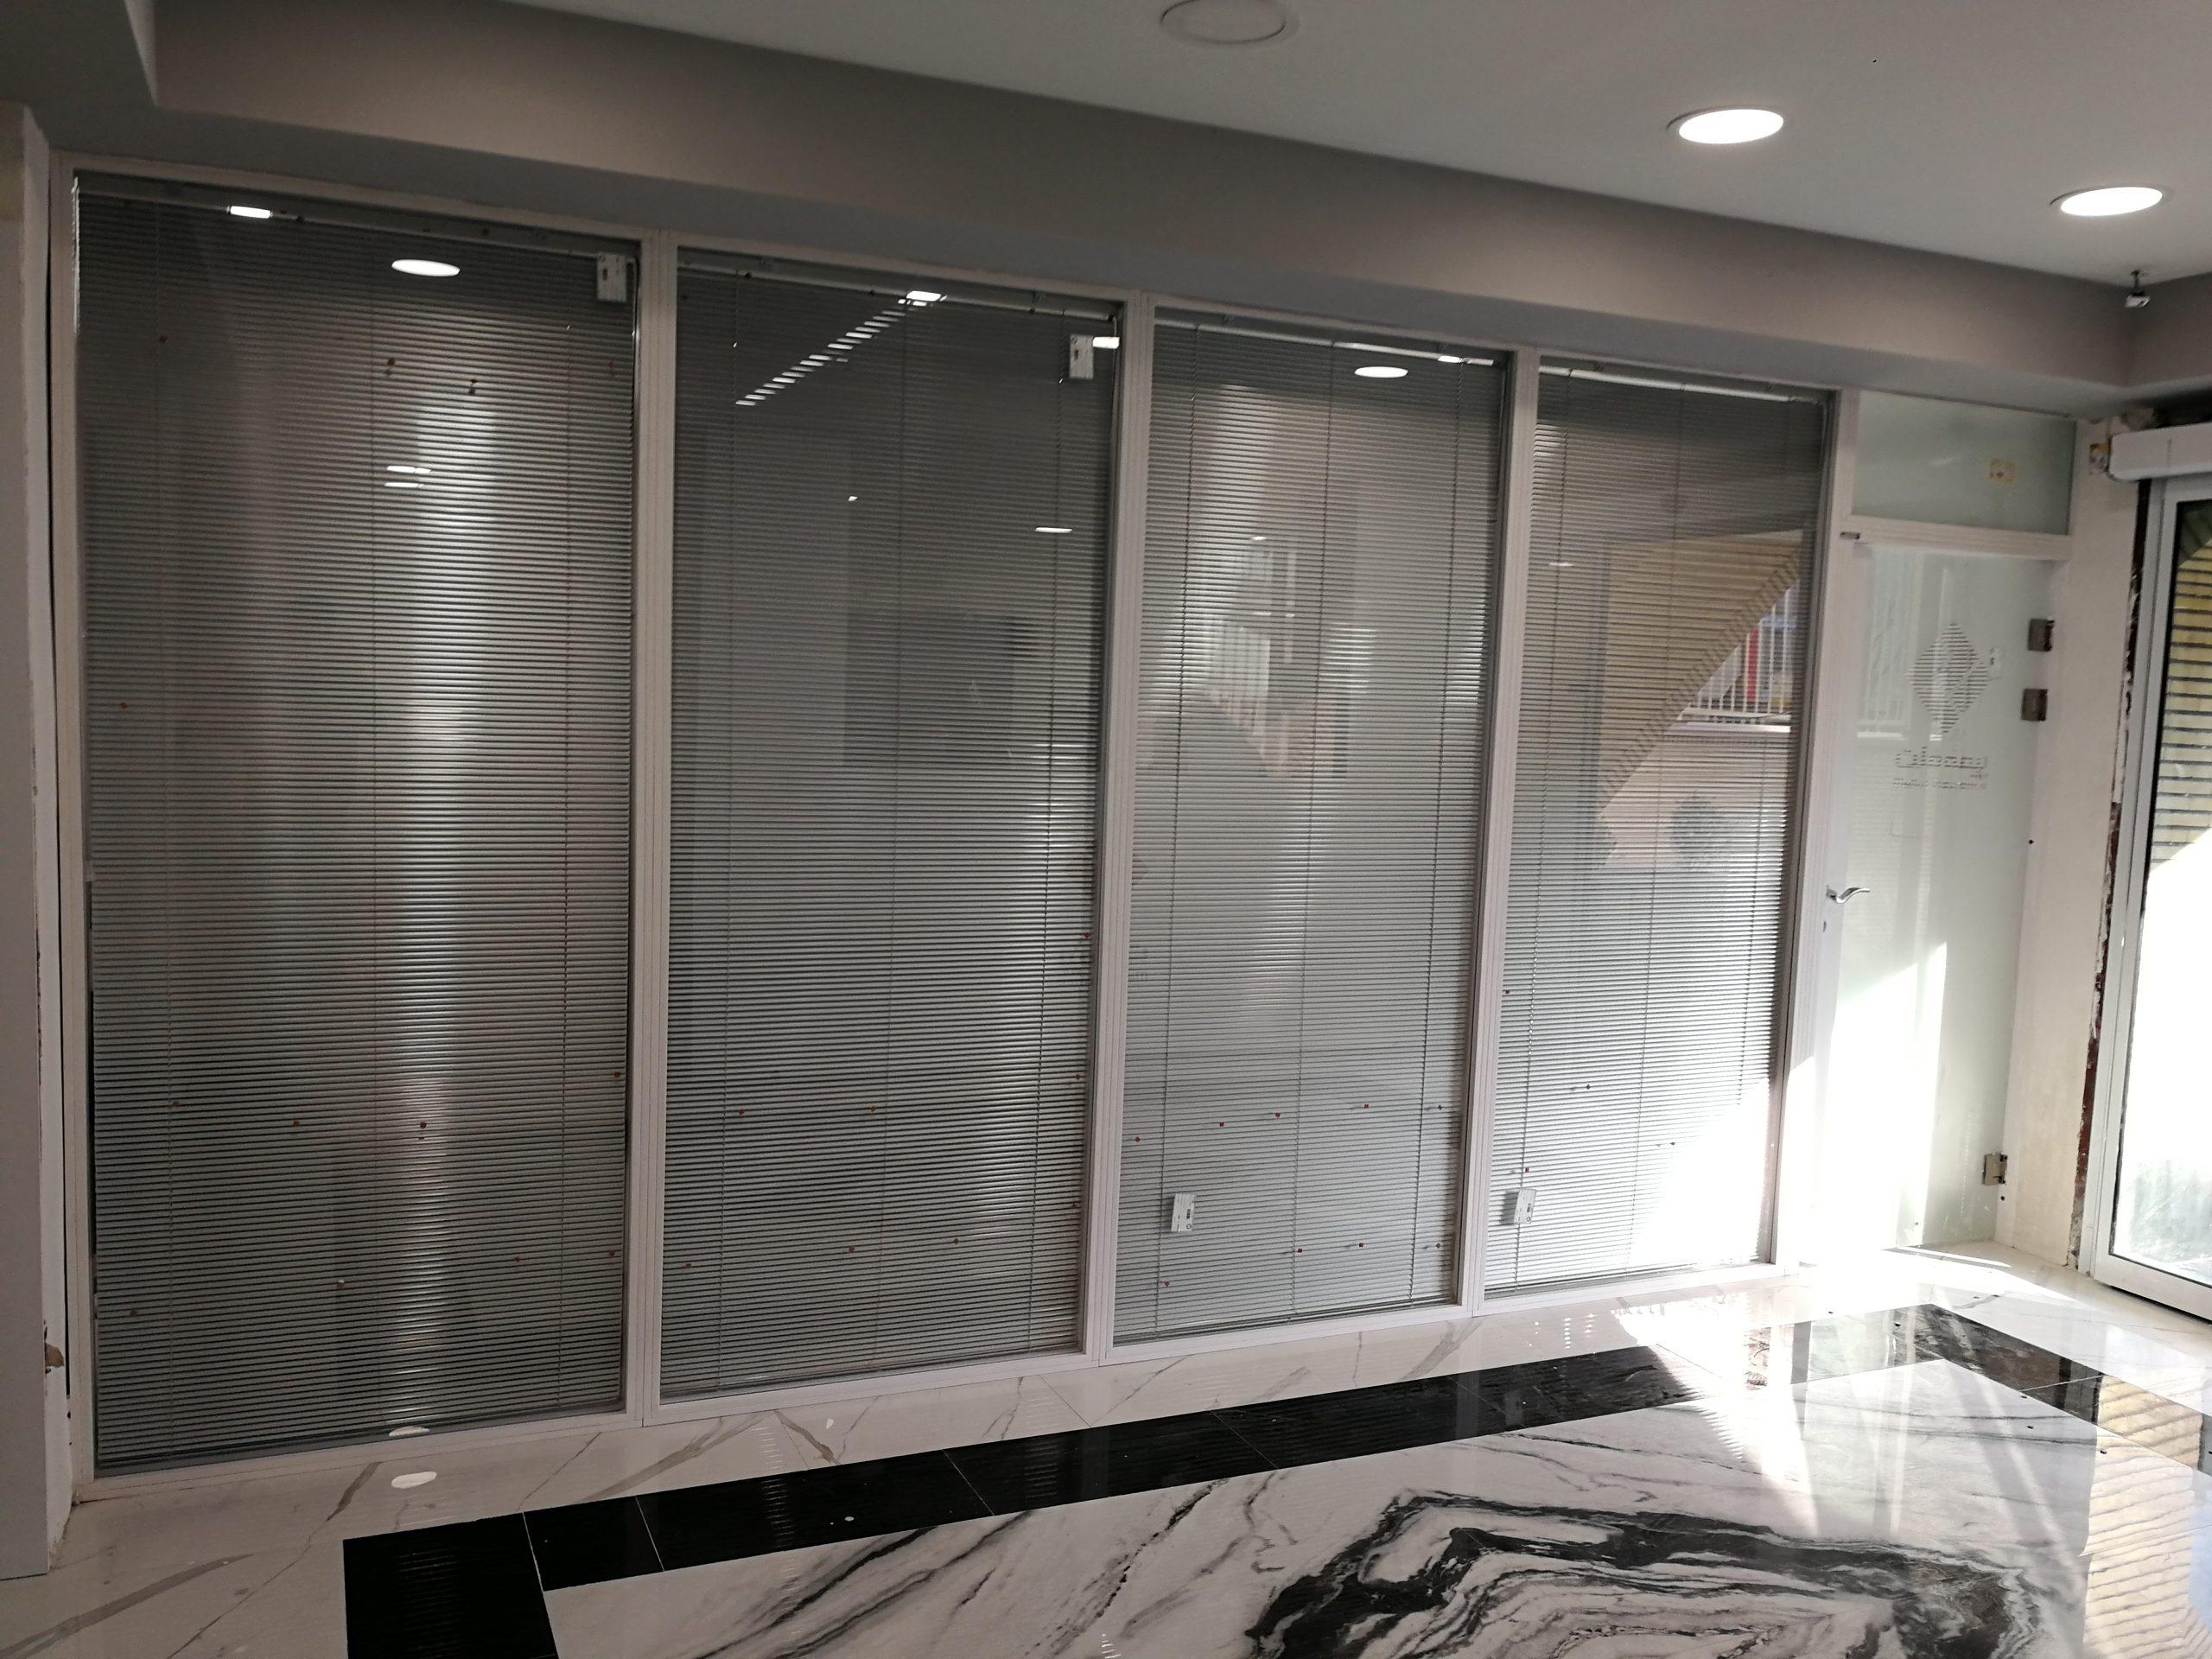 ام دی اف تمام شیشه K200 13 scaled - پارتیشن ام دی اف اداری